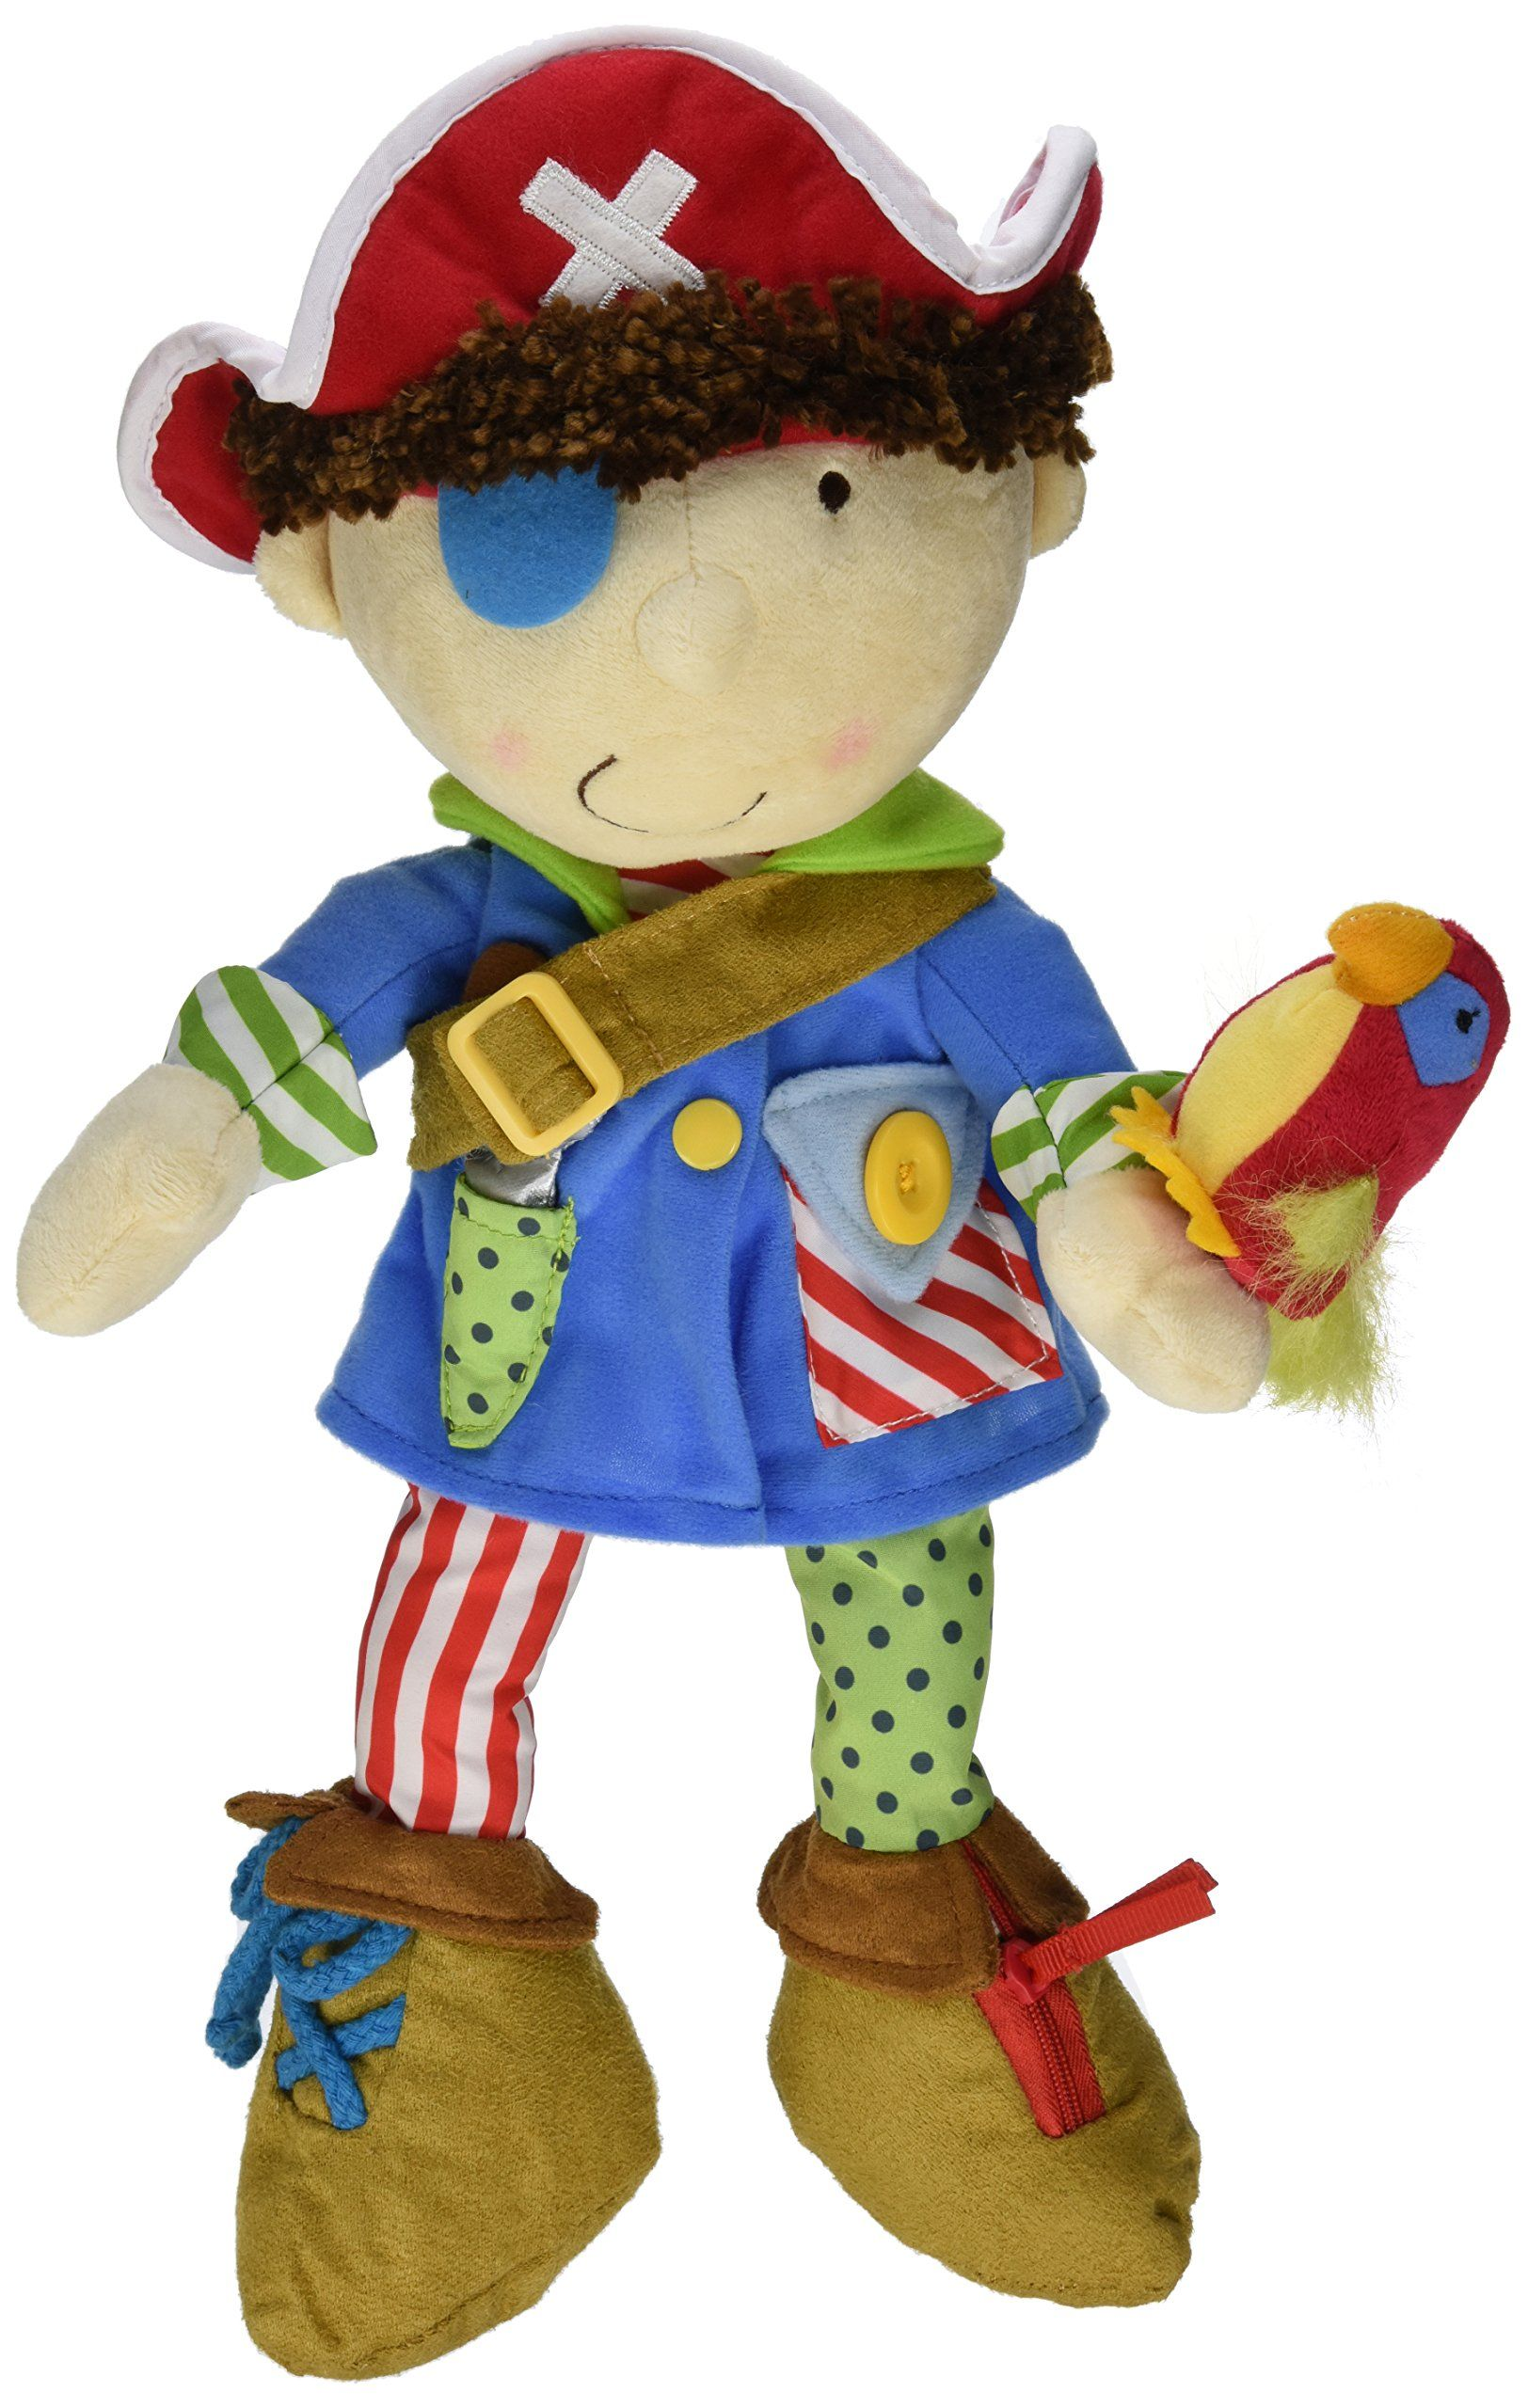 Manhattan Toy Dress Up Pirate 29 Toys, Baby dolls, Baby